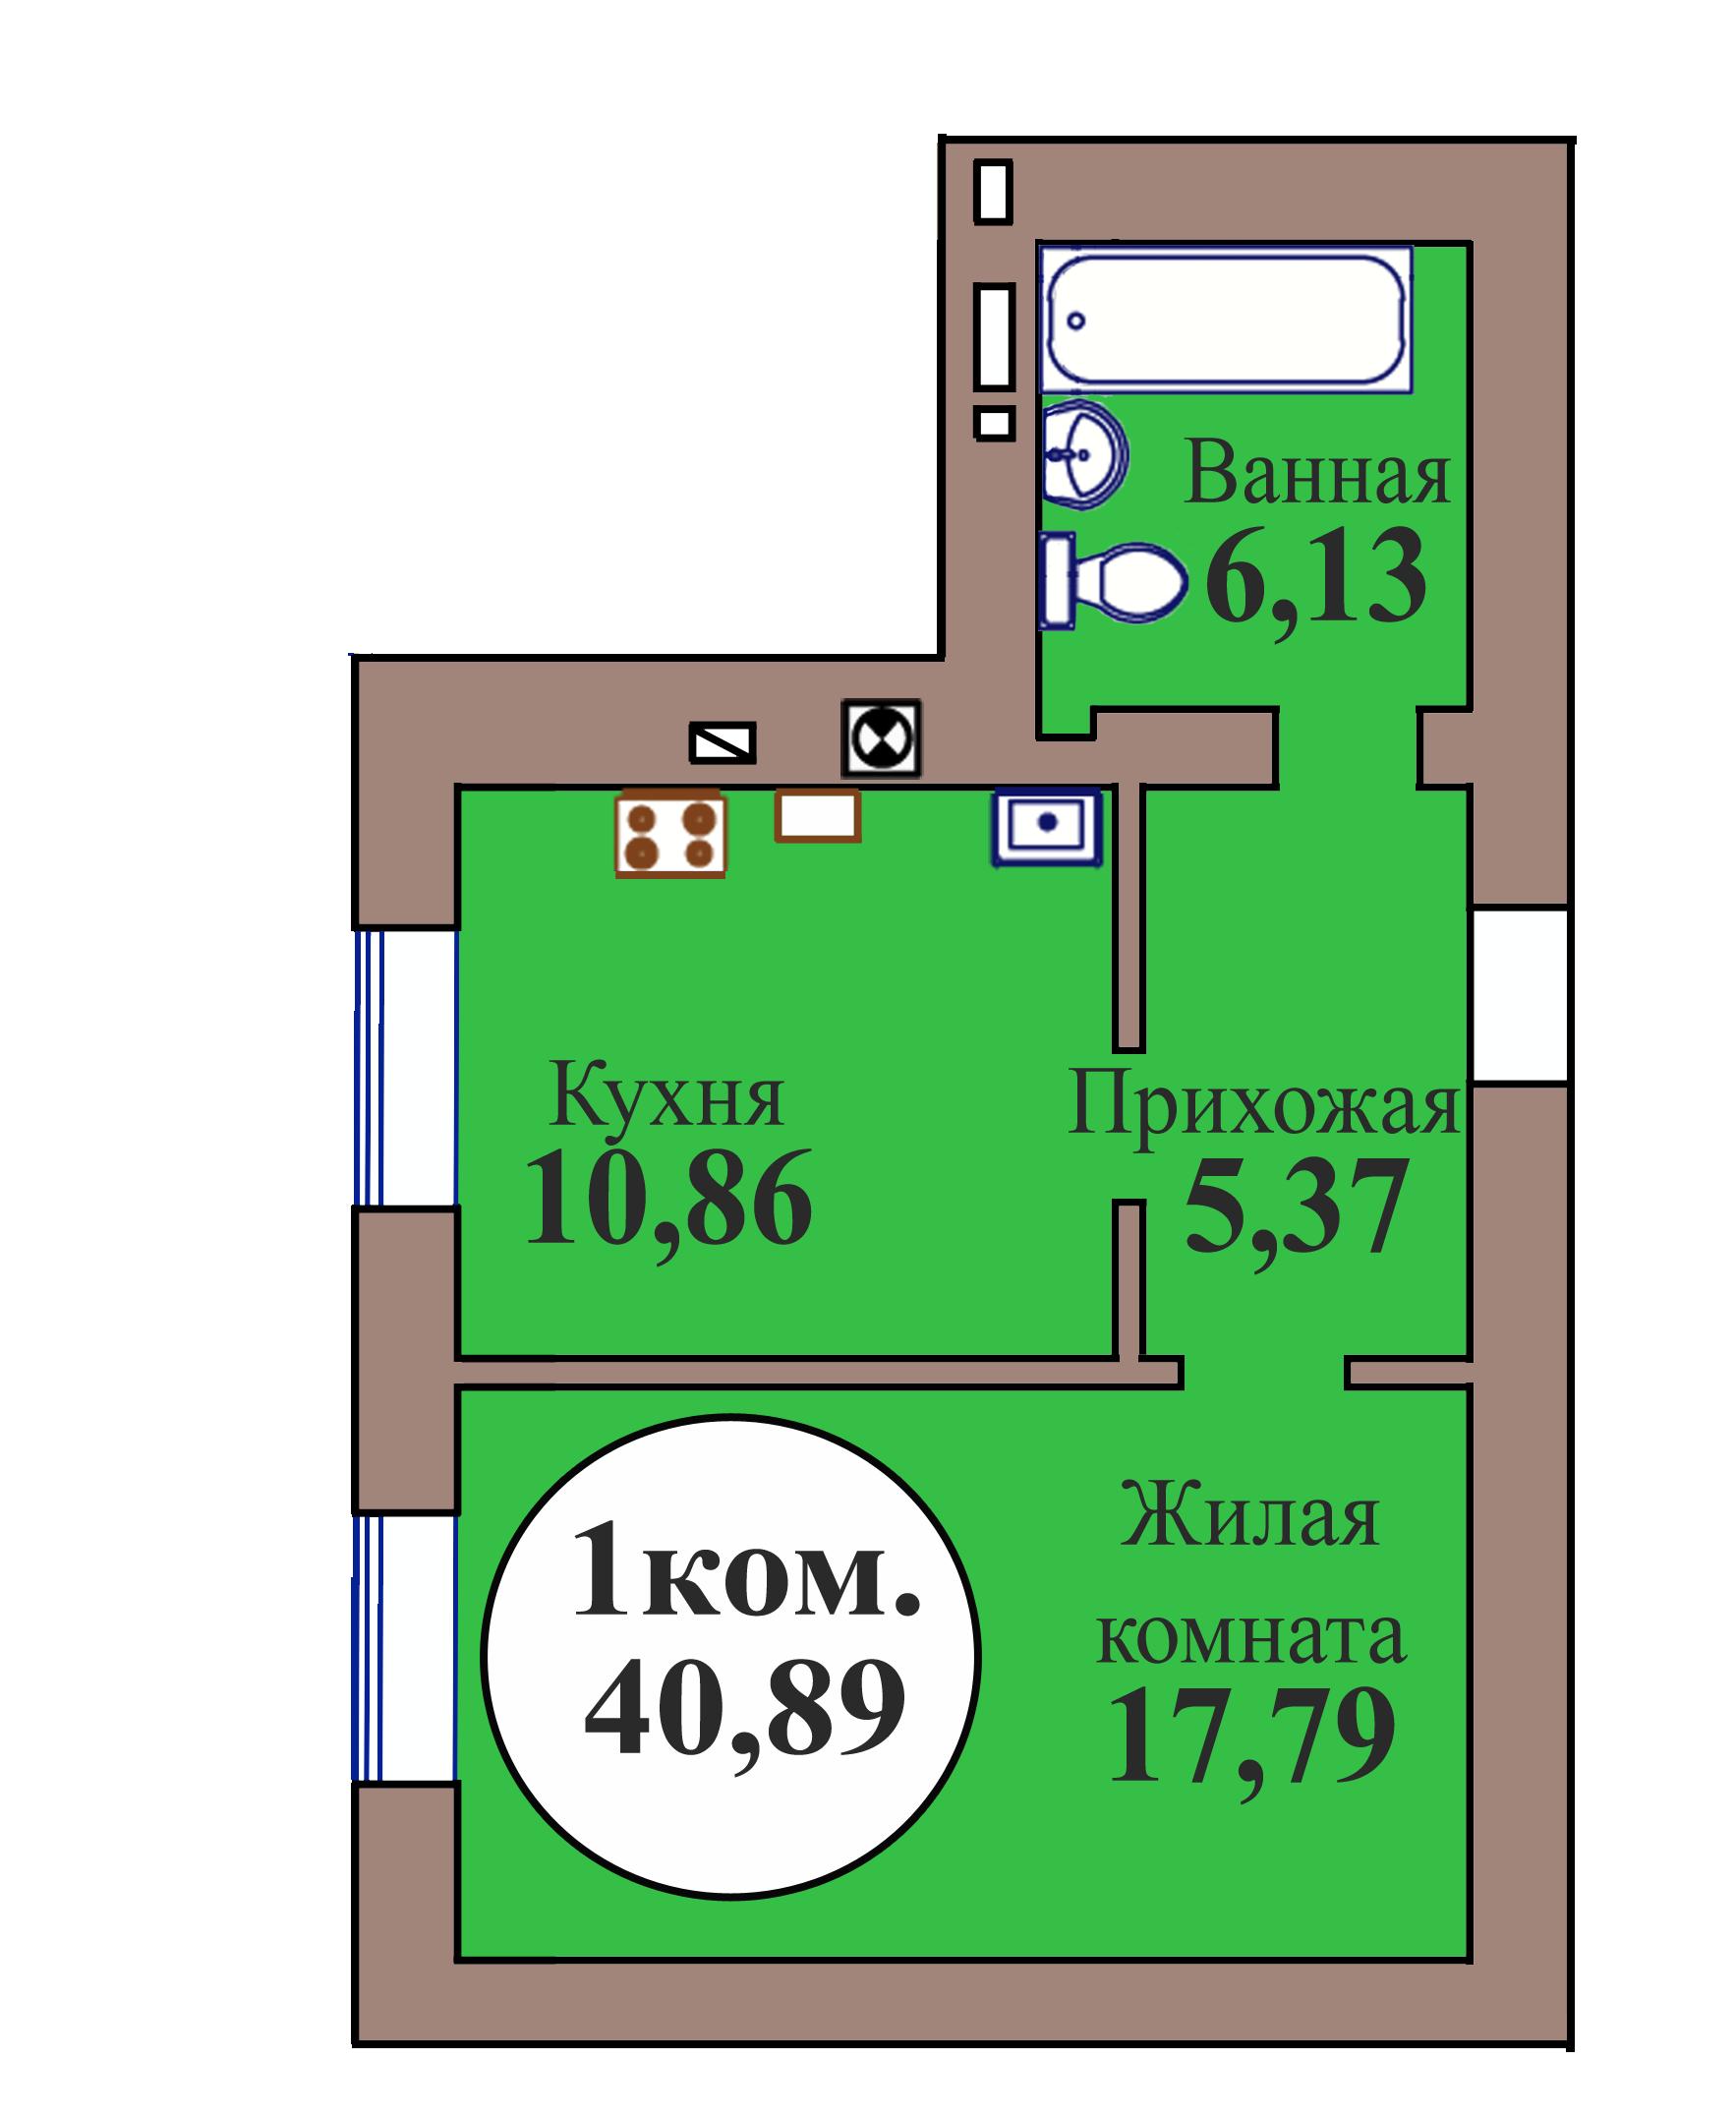 1-комн. кв. по пер. Калининградский, 5 кв. 168 в Калининграде